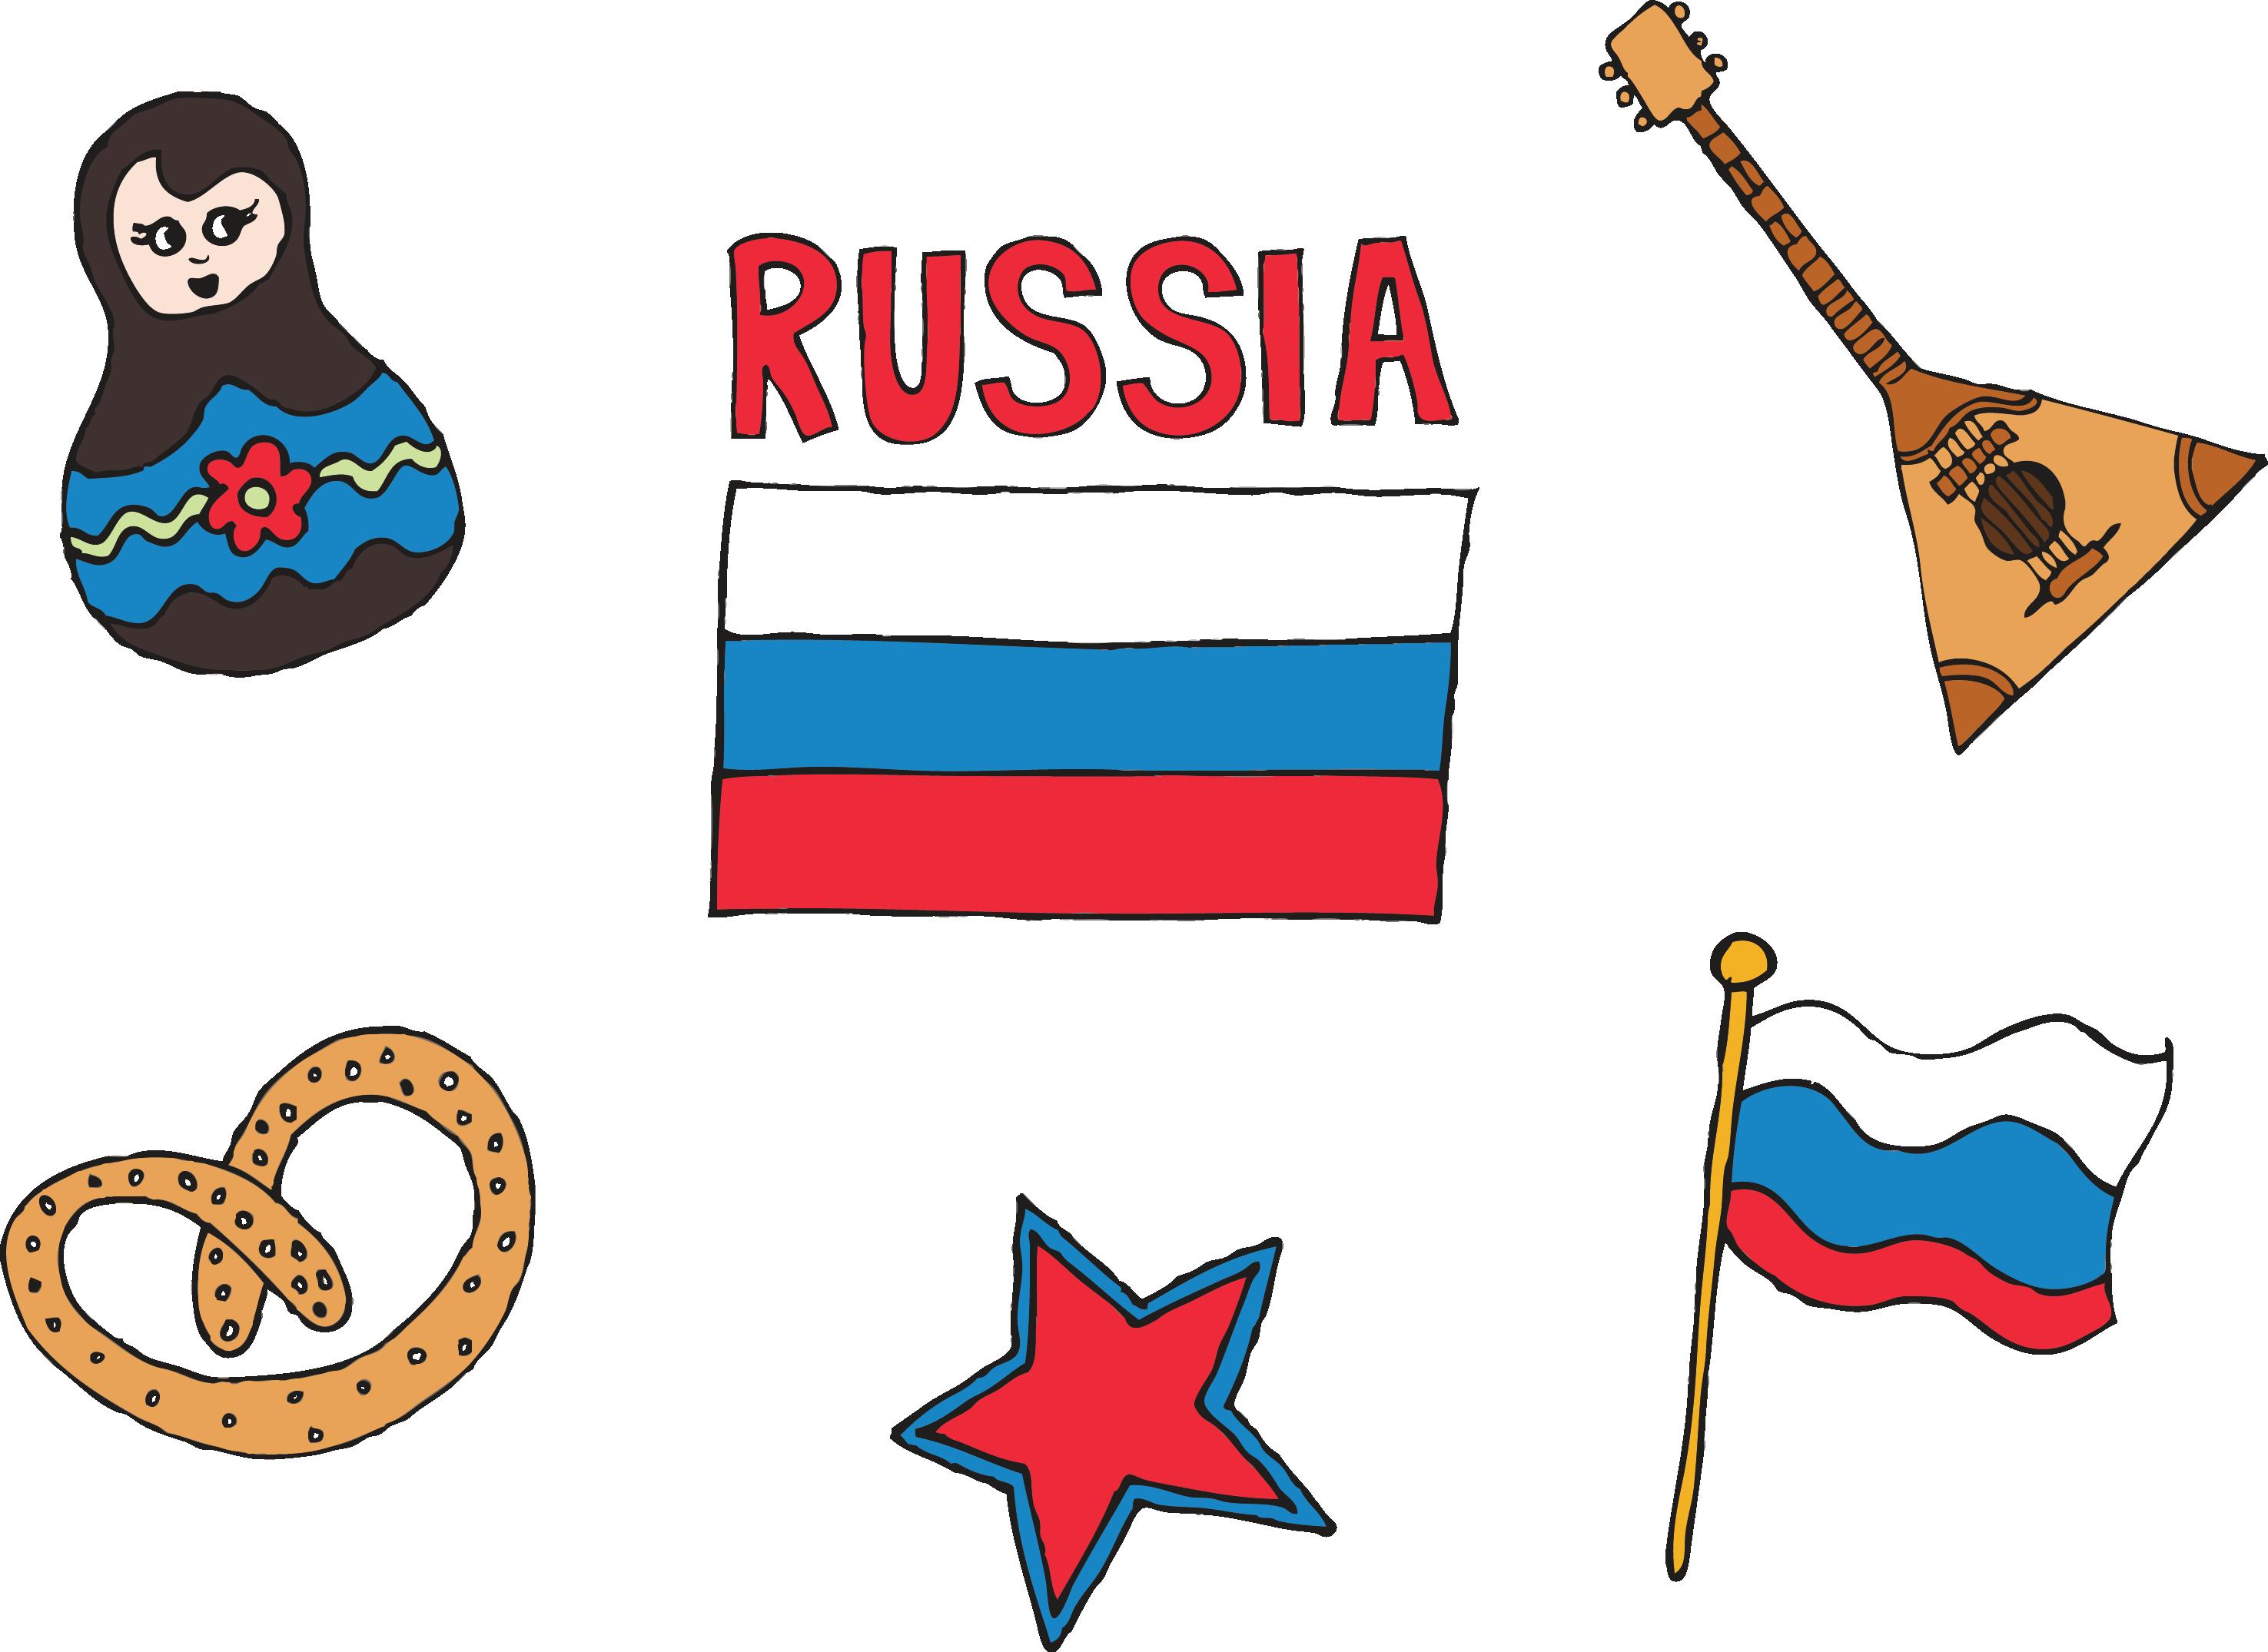 Russian symbols PNG Image.